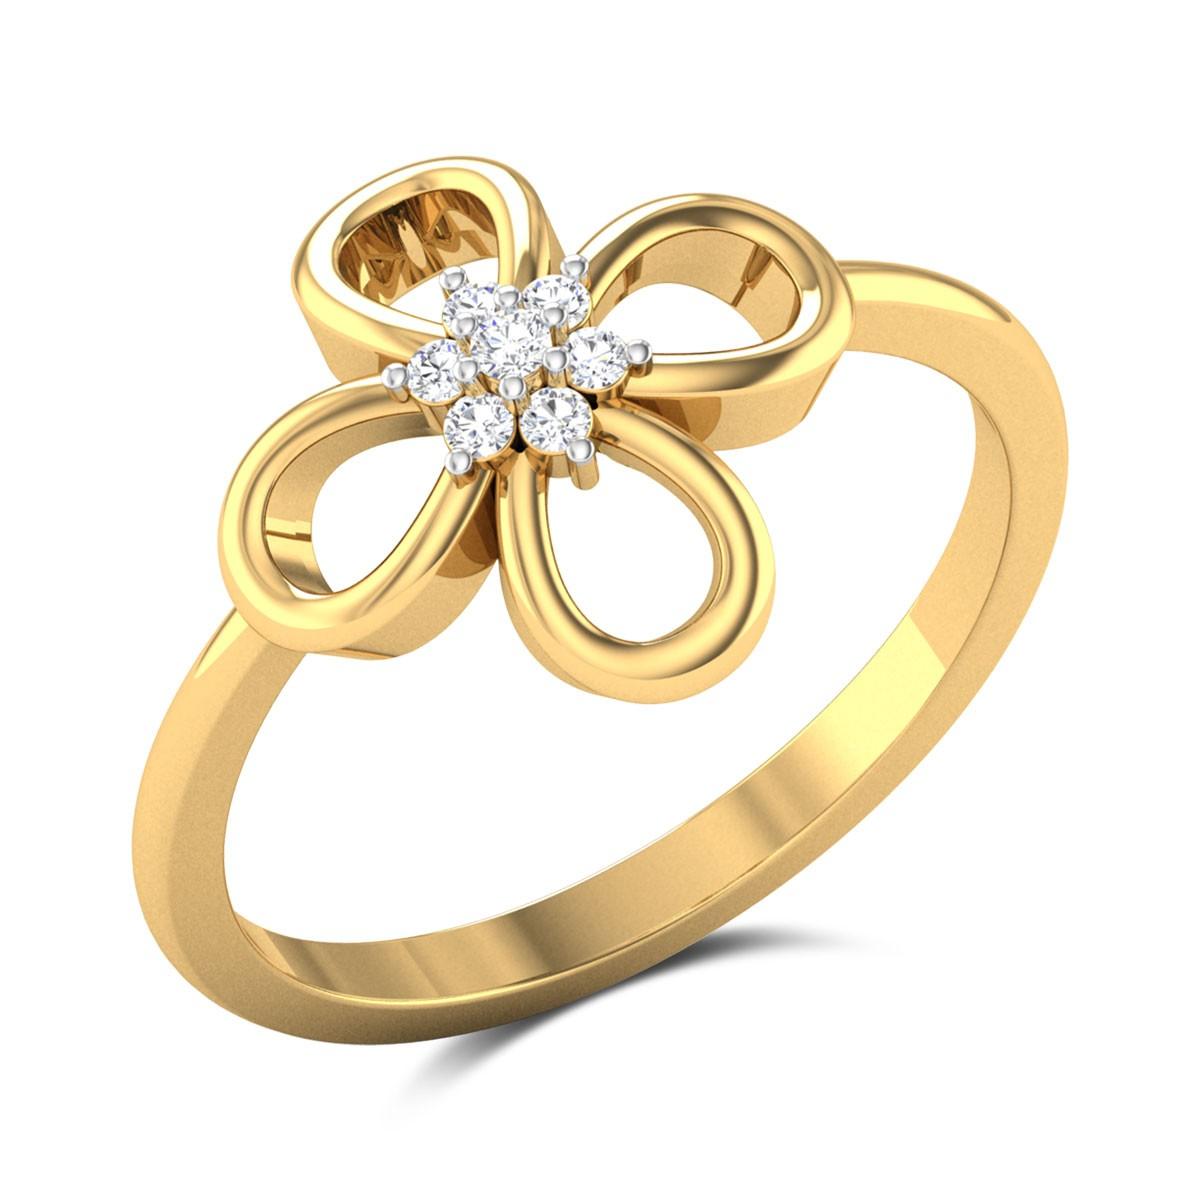 Buy Francesca 7 Stone Diamond Ring in 2.03 Gms Gold Online